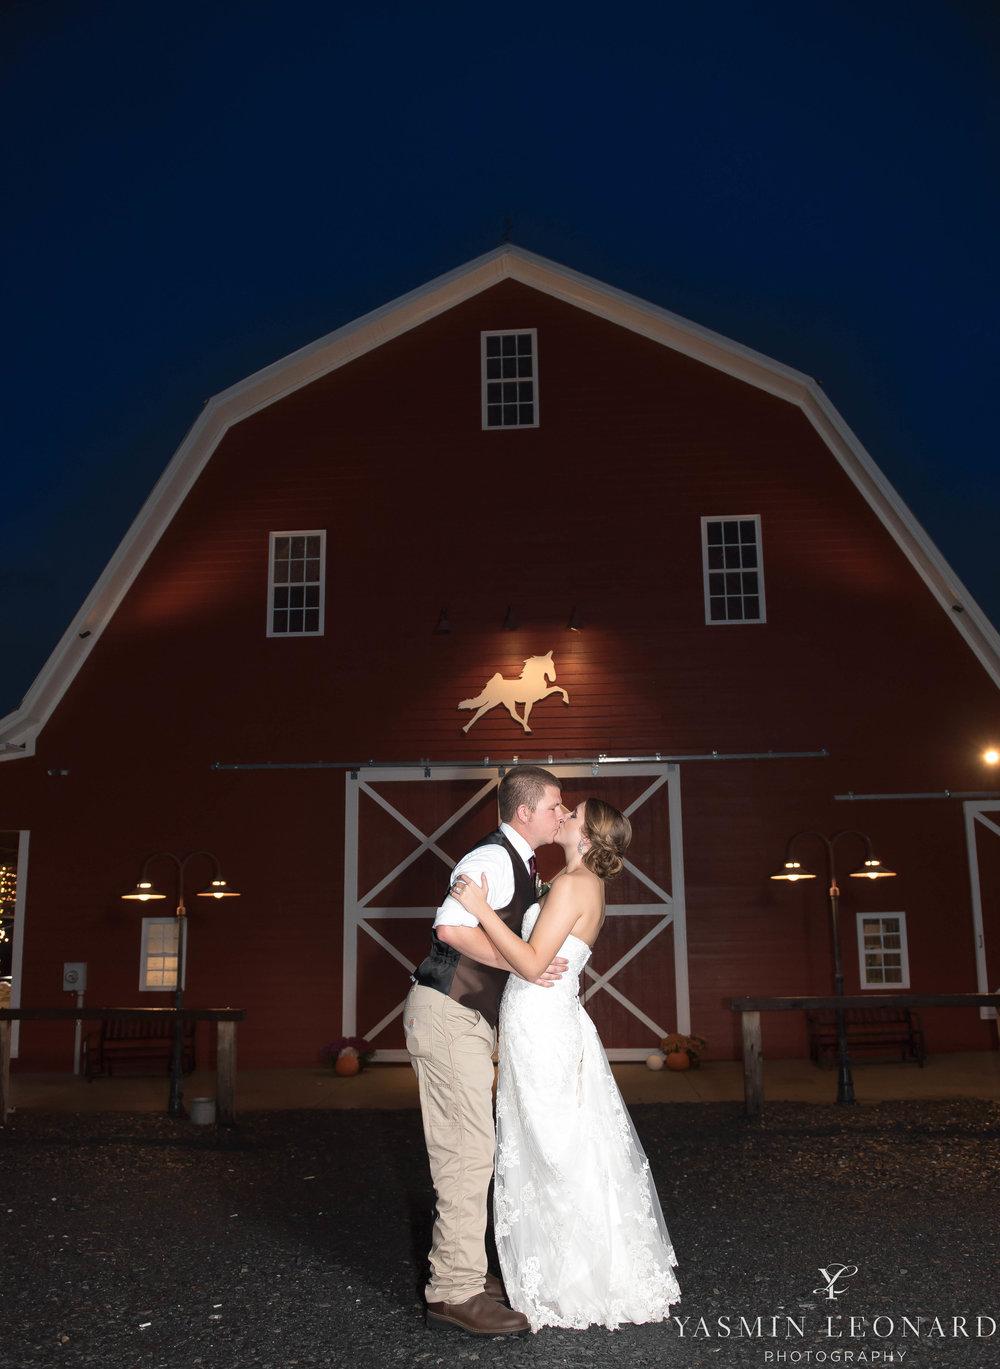 Millikan Farms - NC Wedding Venue - NC Wedding Photographer - Yasmin Leonard Photography - Rain on your wedding day-77.jpg